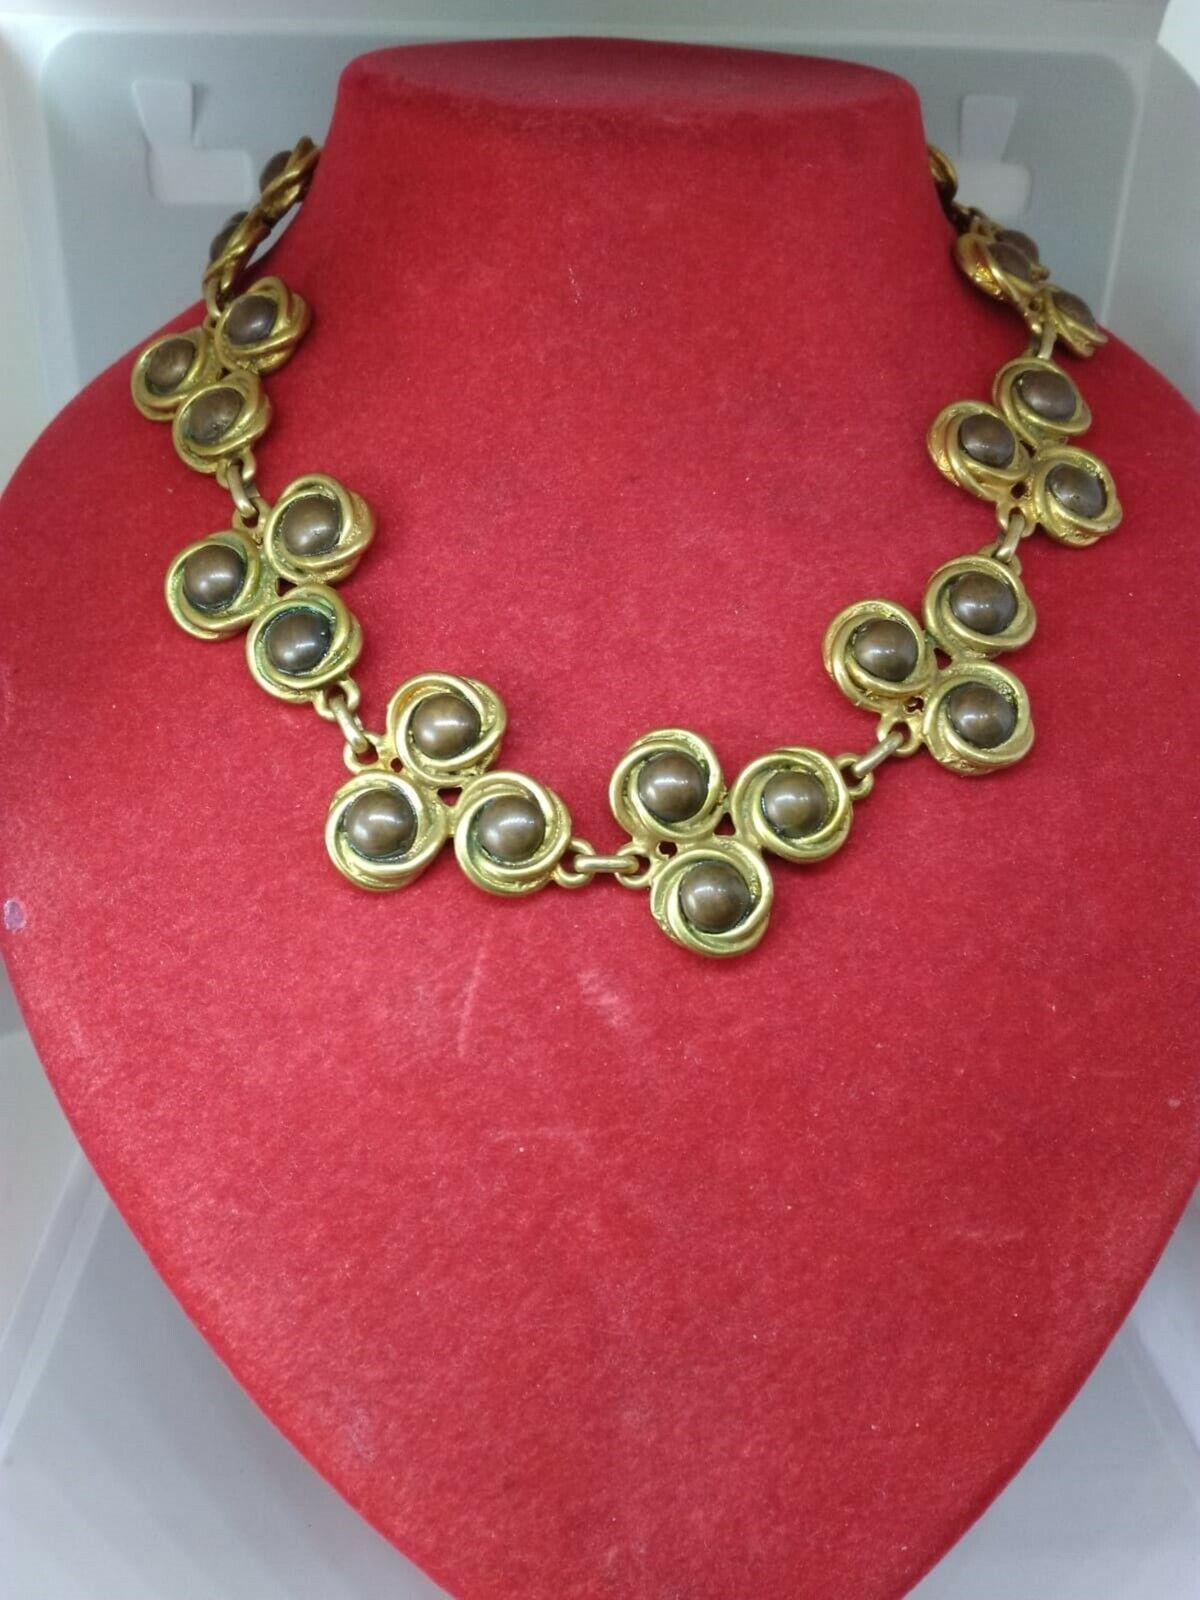 Ancient Necklace Vintage Choker Necklace Women Gold Metal 70/80 years-show original title